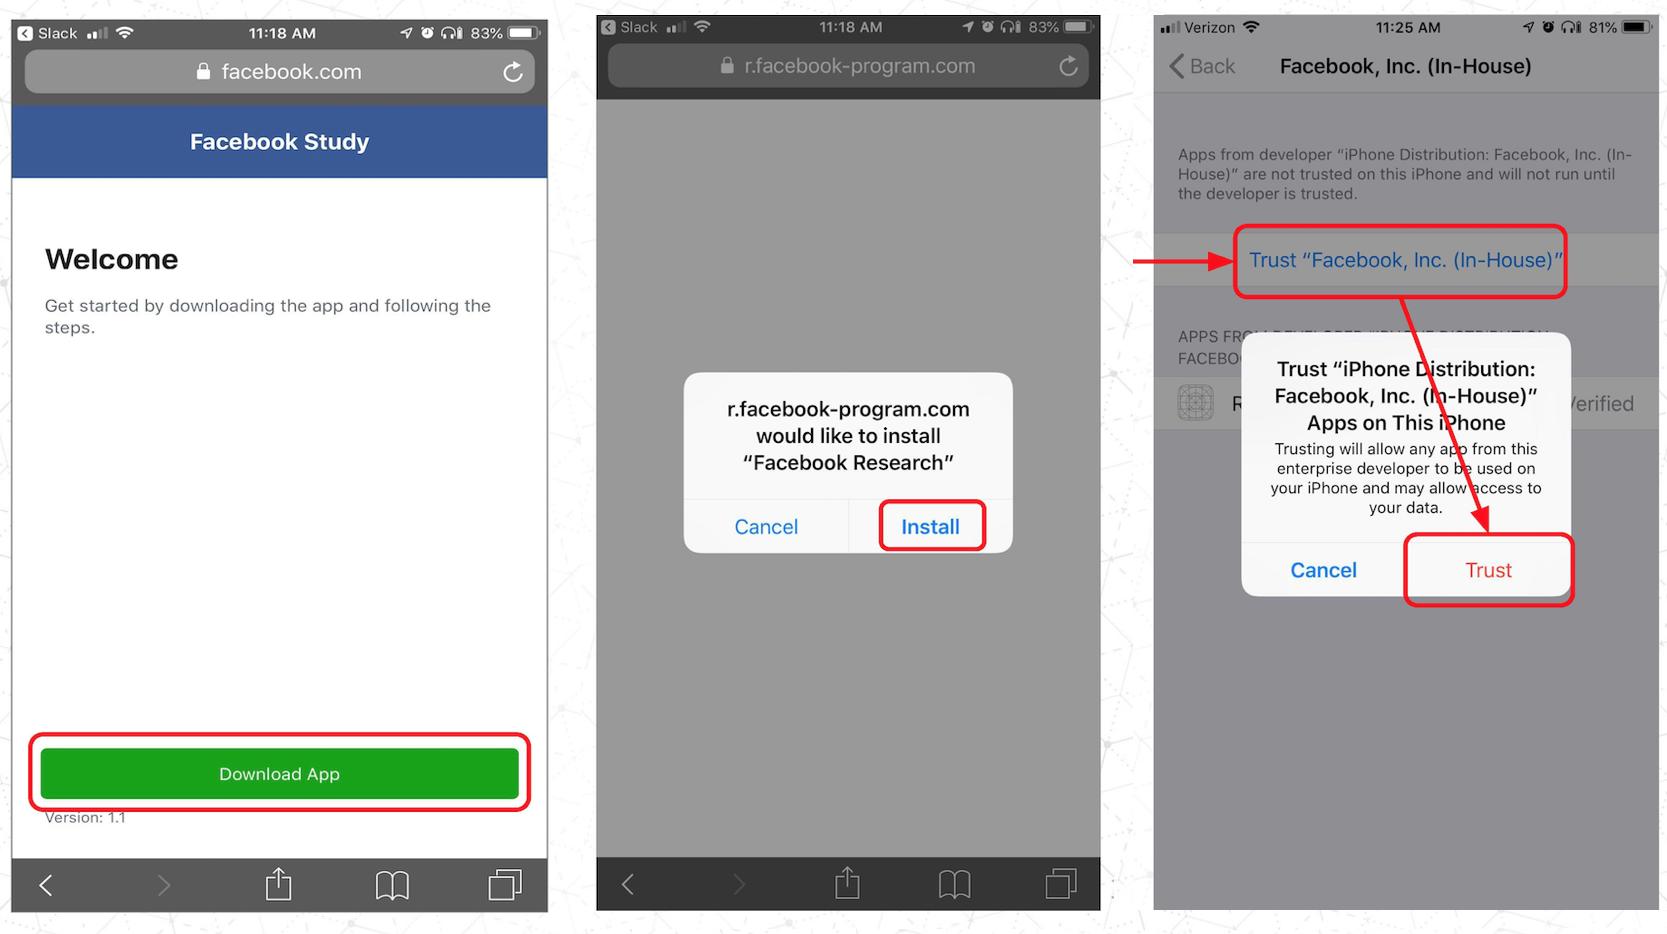 Techmeme: Apple says it revoked Facebook's Enterprise Certificate